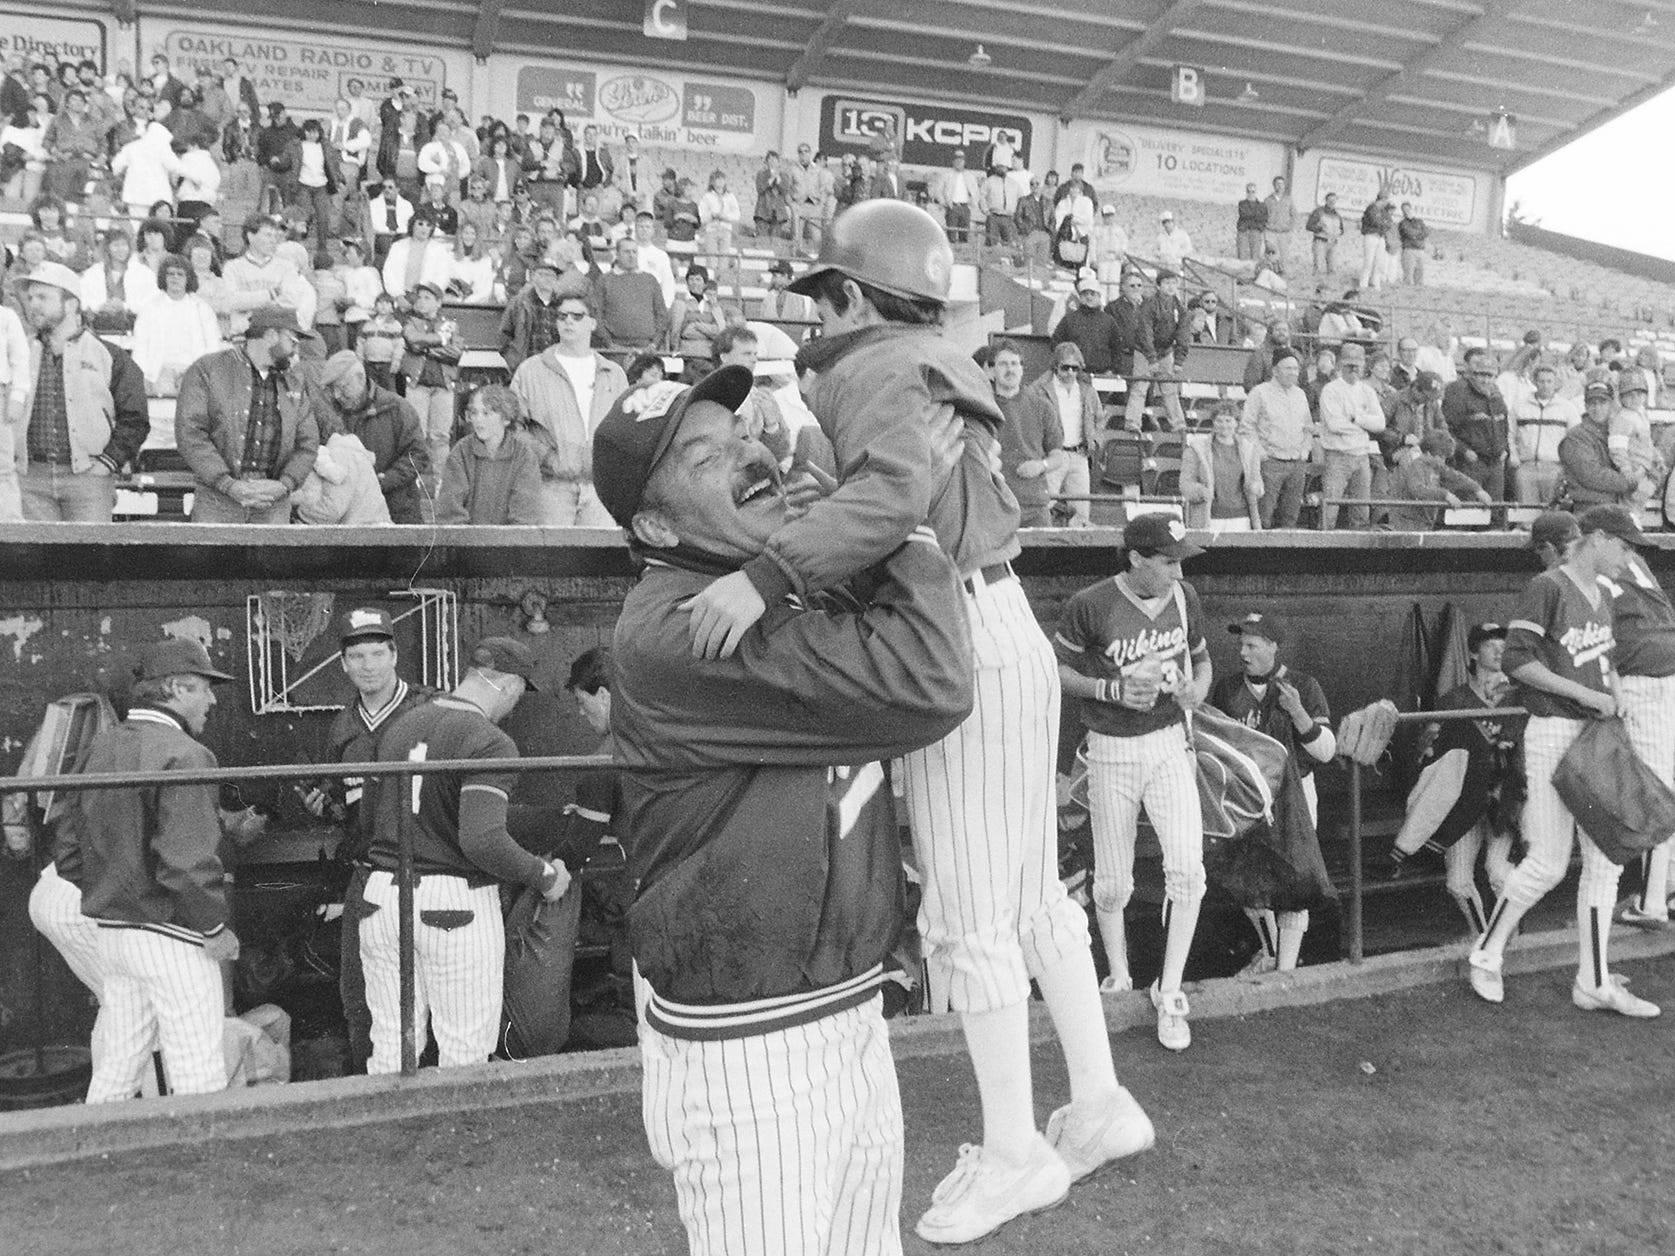 05/28/88NK vs Tahoma Baseball State Title Game